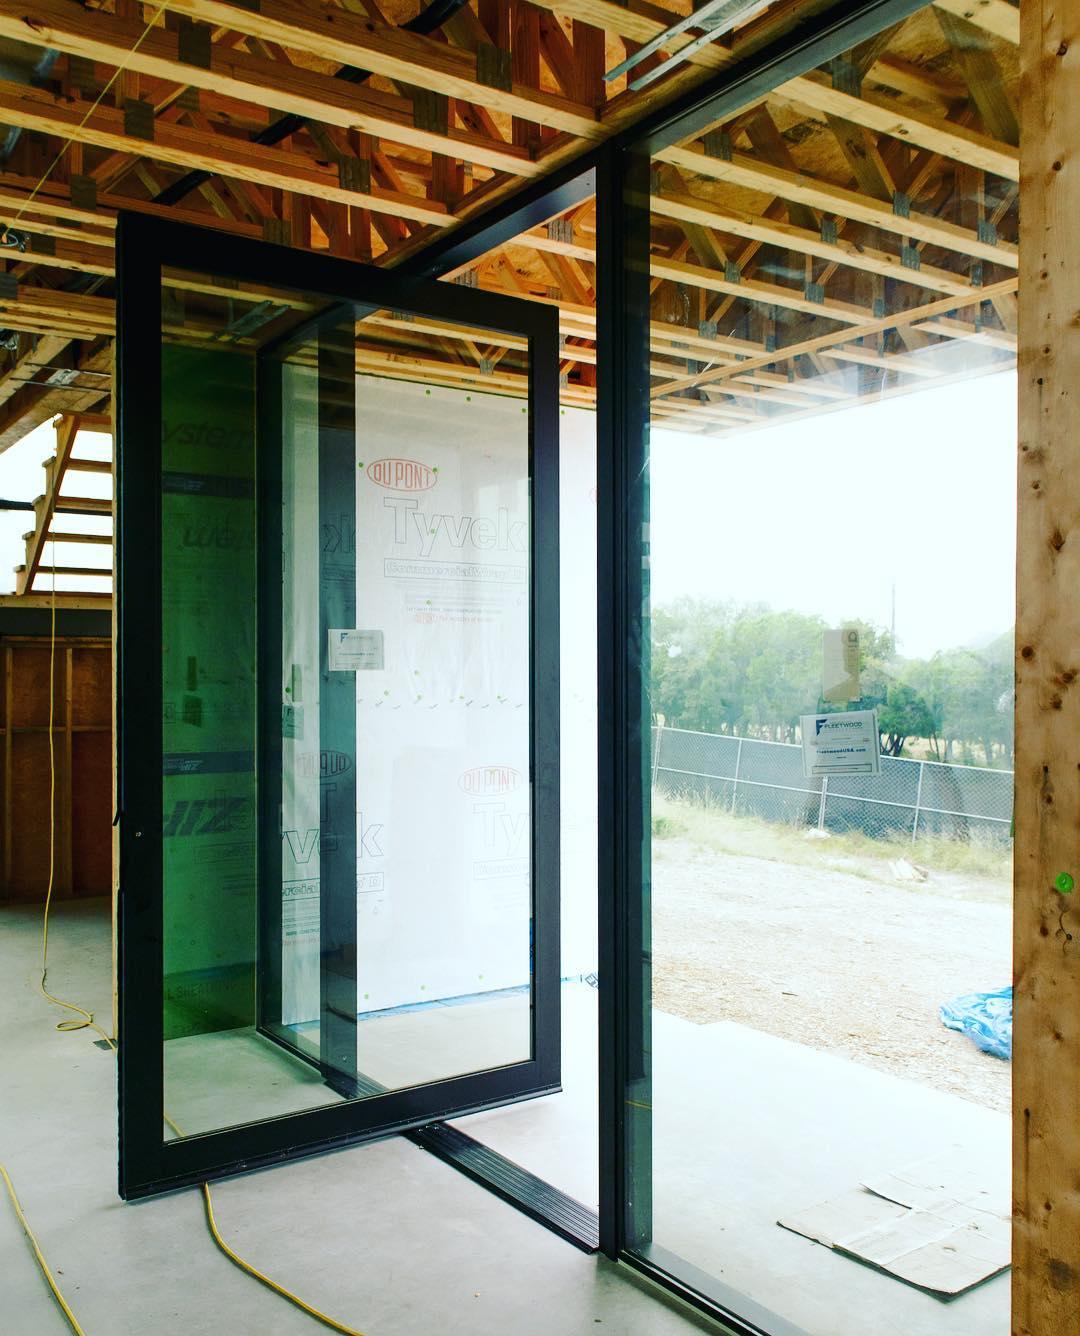 Fleetwood pivot door ready! Designed by @dc_architecture Built by @foursquarebuilders Photo by @redpantsstudio